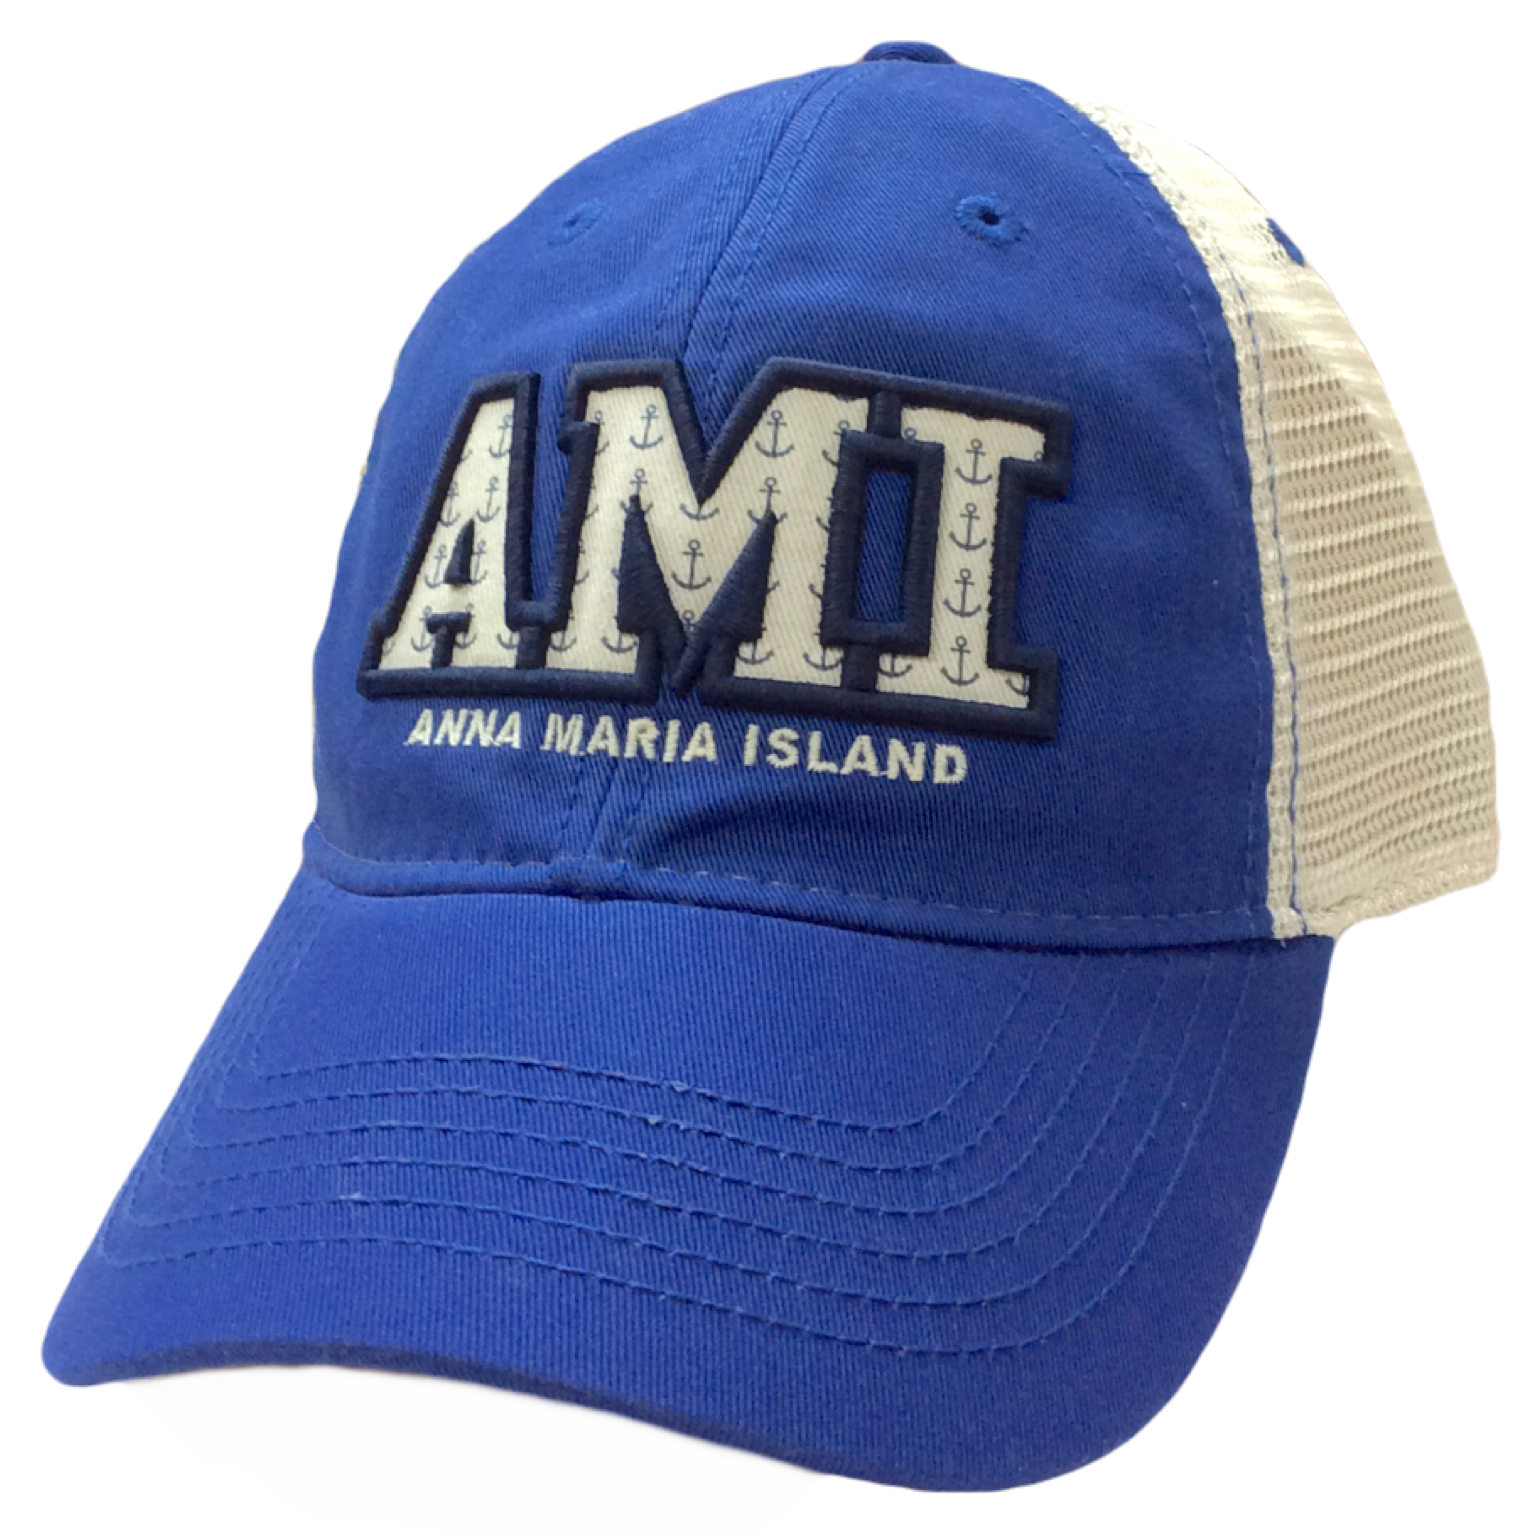 Anna Maria Island Hats